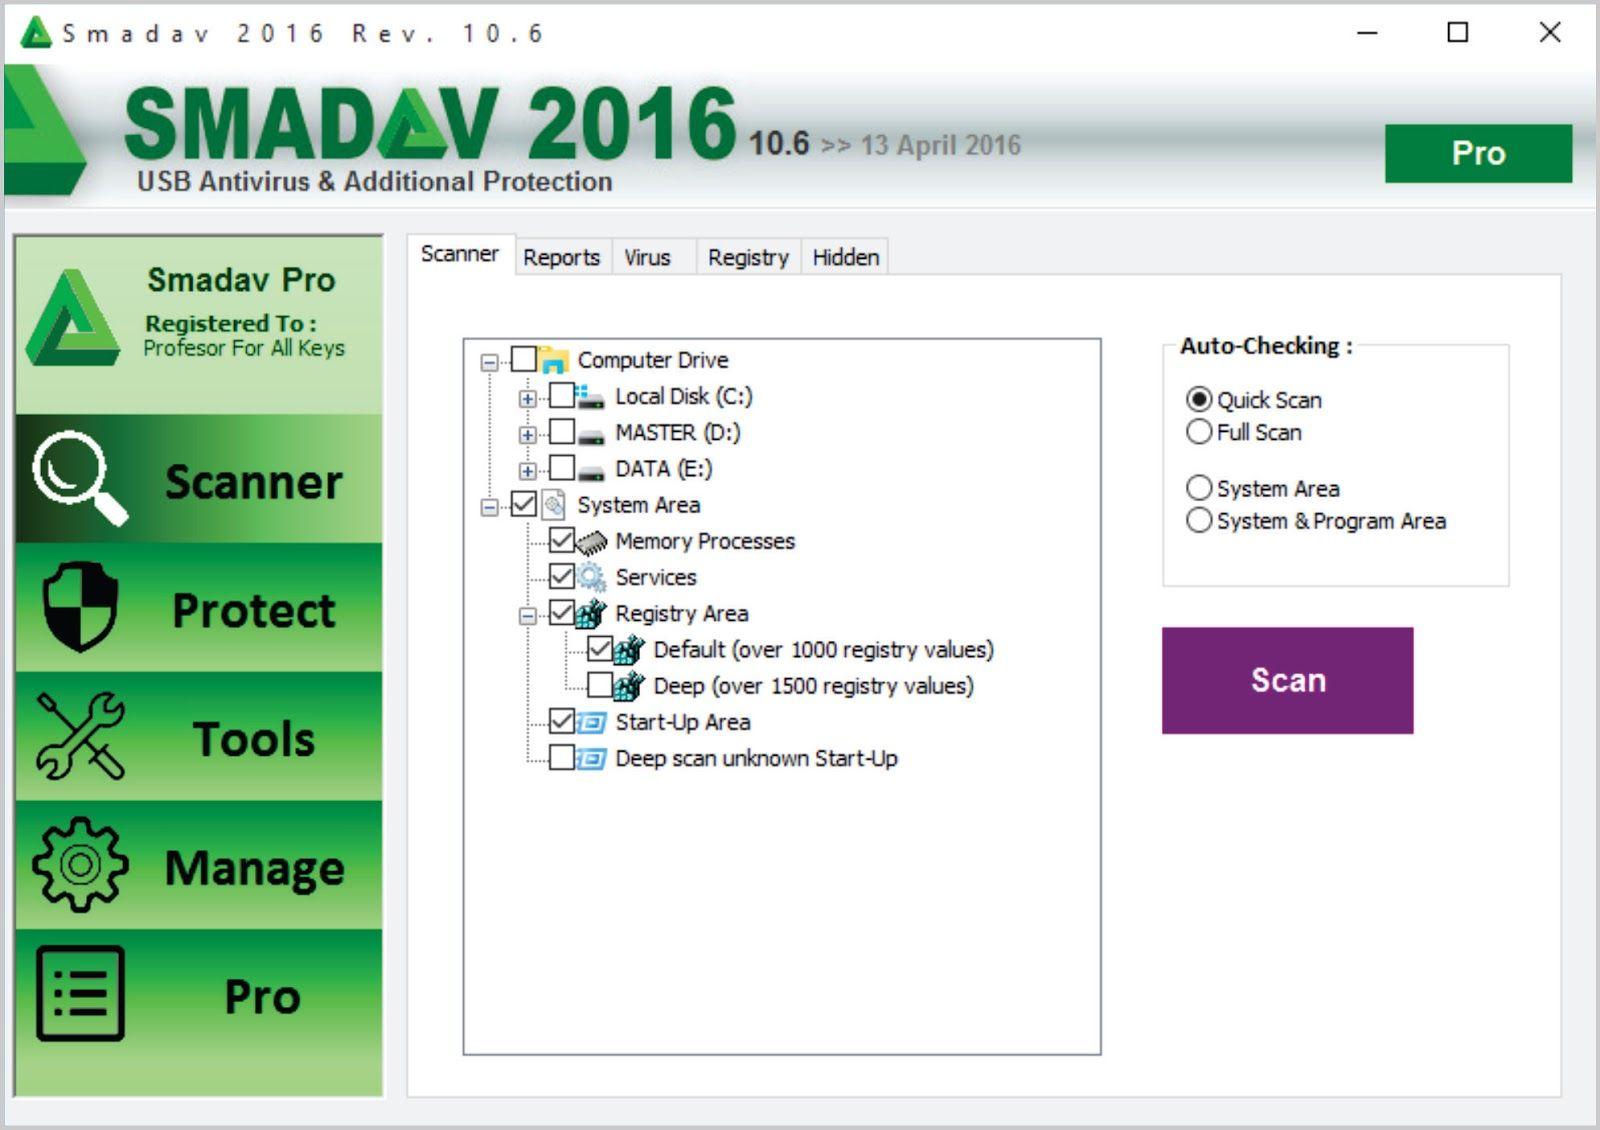 Smadav Pro Registar Latest Version 2017 Antivirus Download Pro